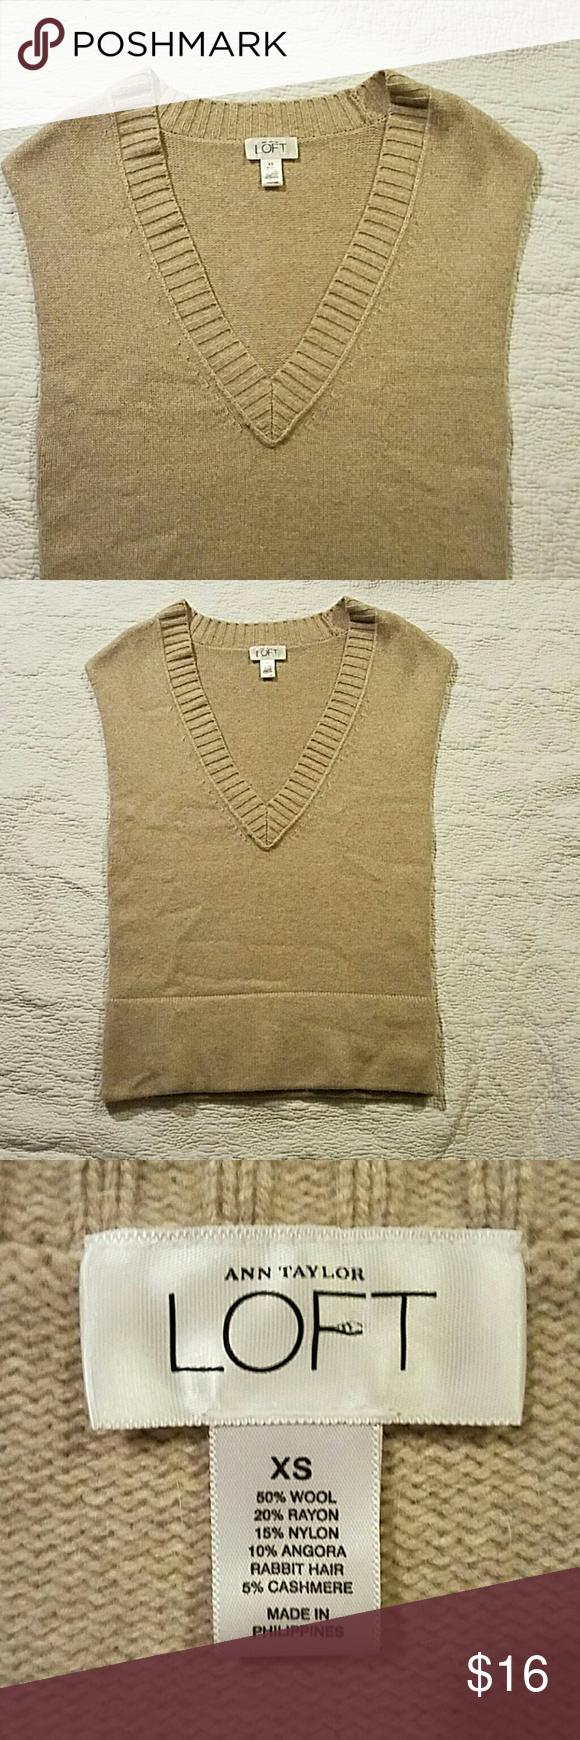 Ann Taylor Loft sleeveless sweater Super soft. Excellent condition LOFT Sweaters V-Necks